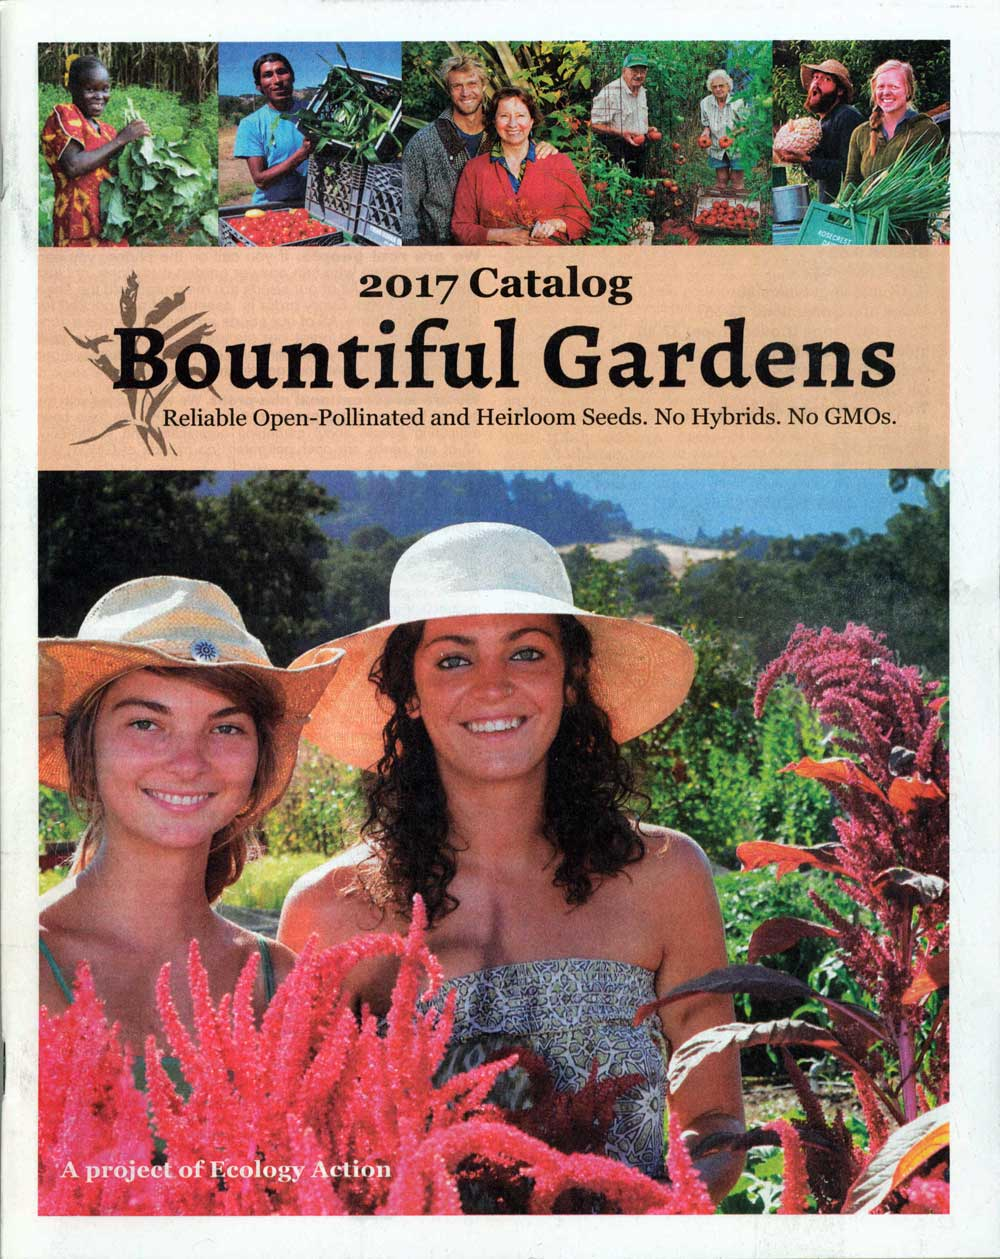 Bountiful Gardens, California, 8.25 x 10.25 in., 72 pp.